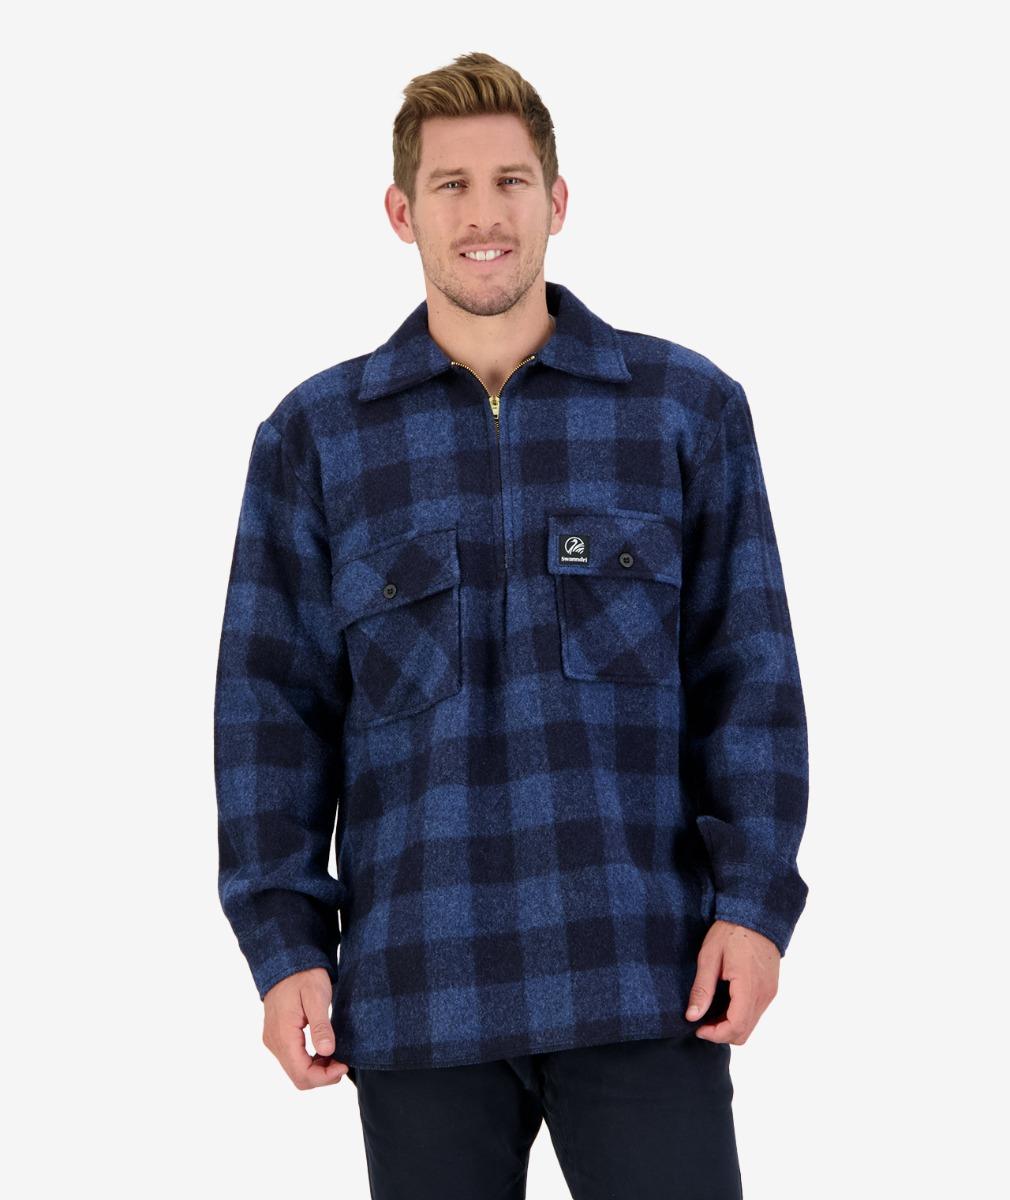 Swanndri Men's Ranger Wool Zip Front Bush Shirt in Ink Check